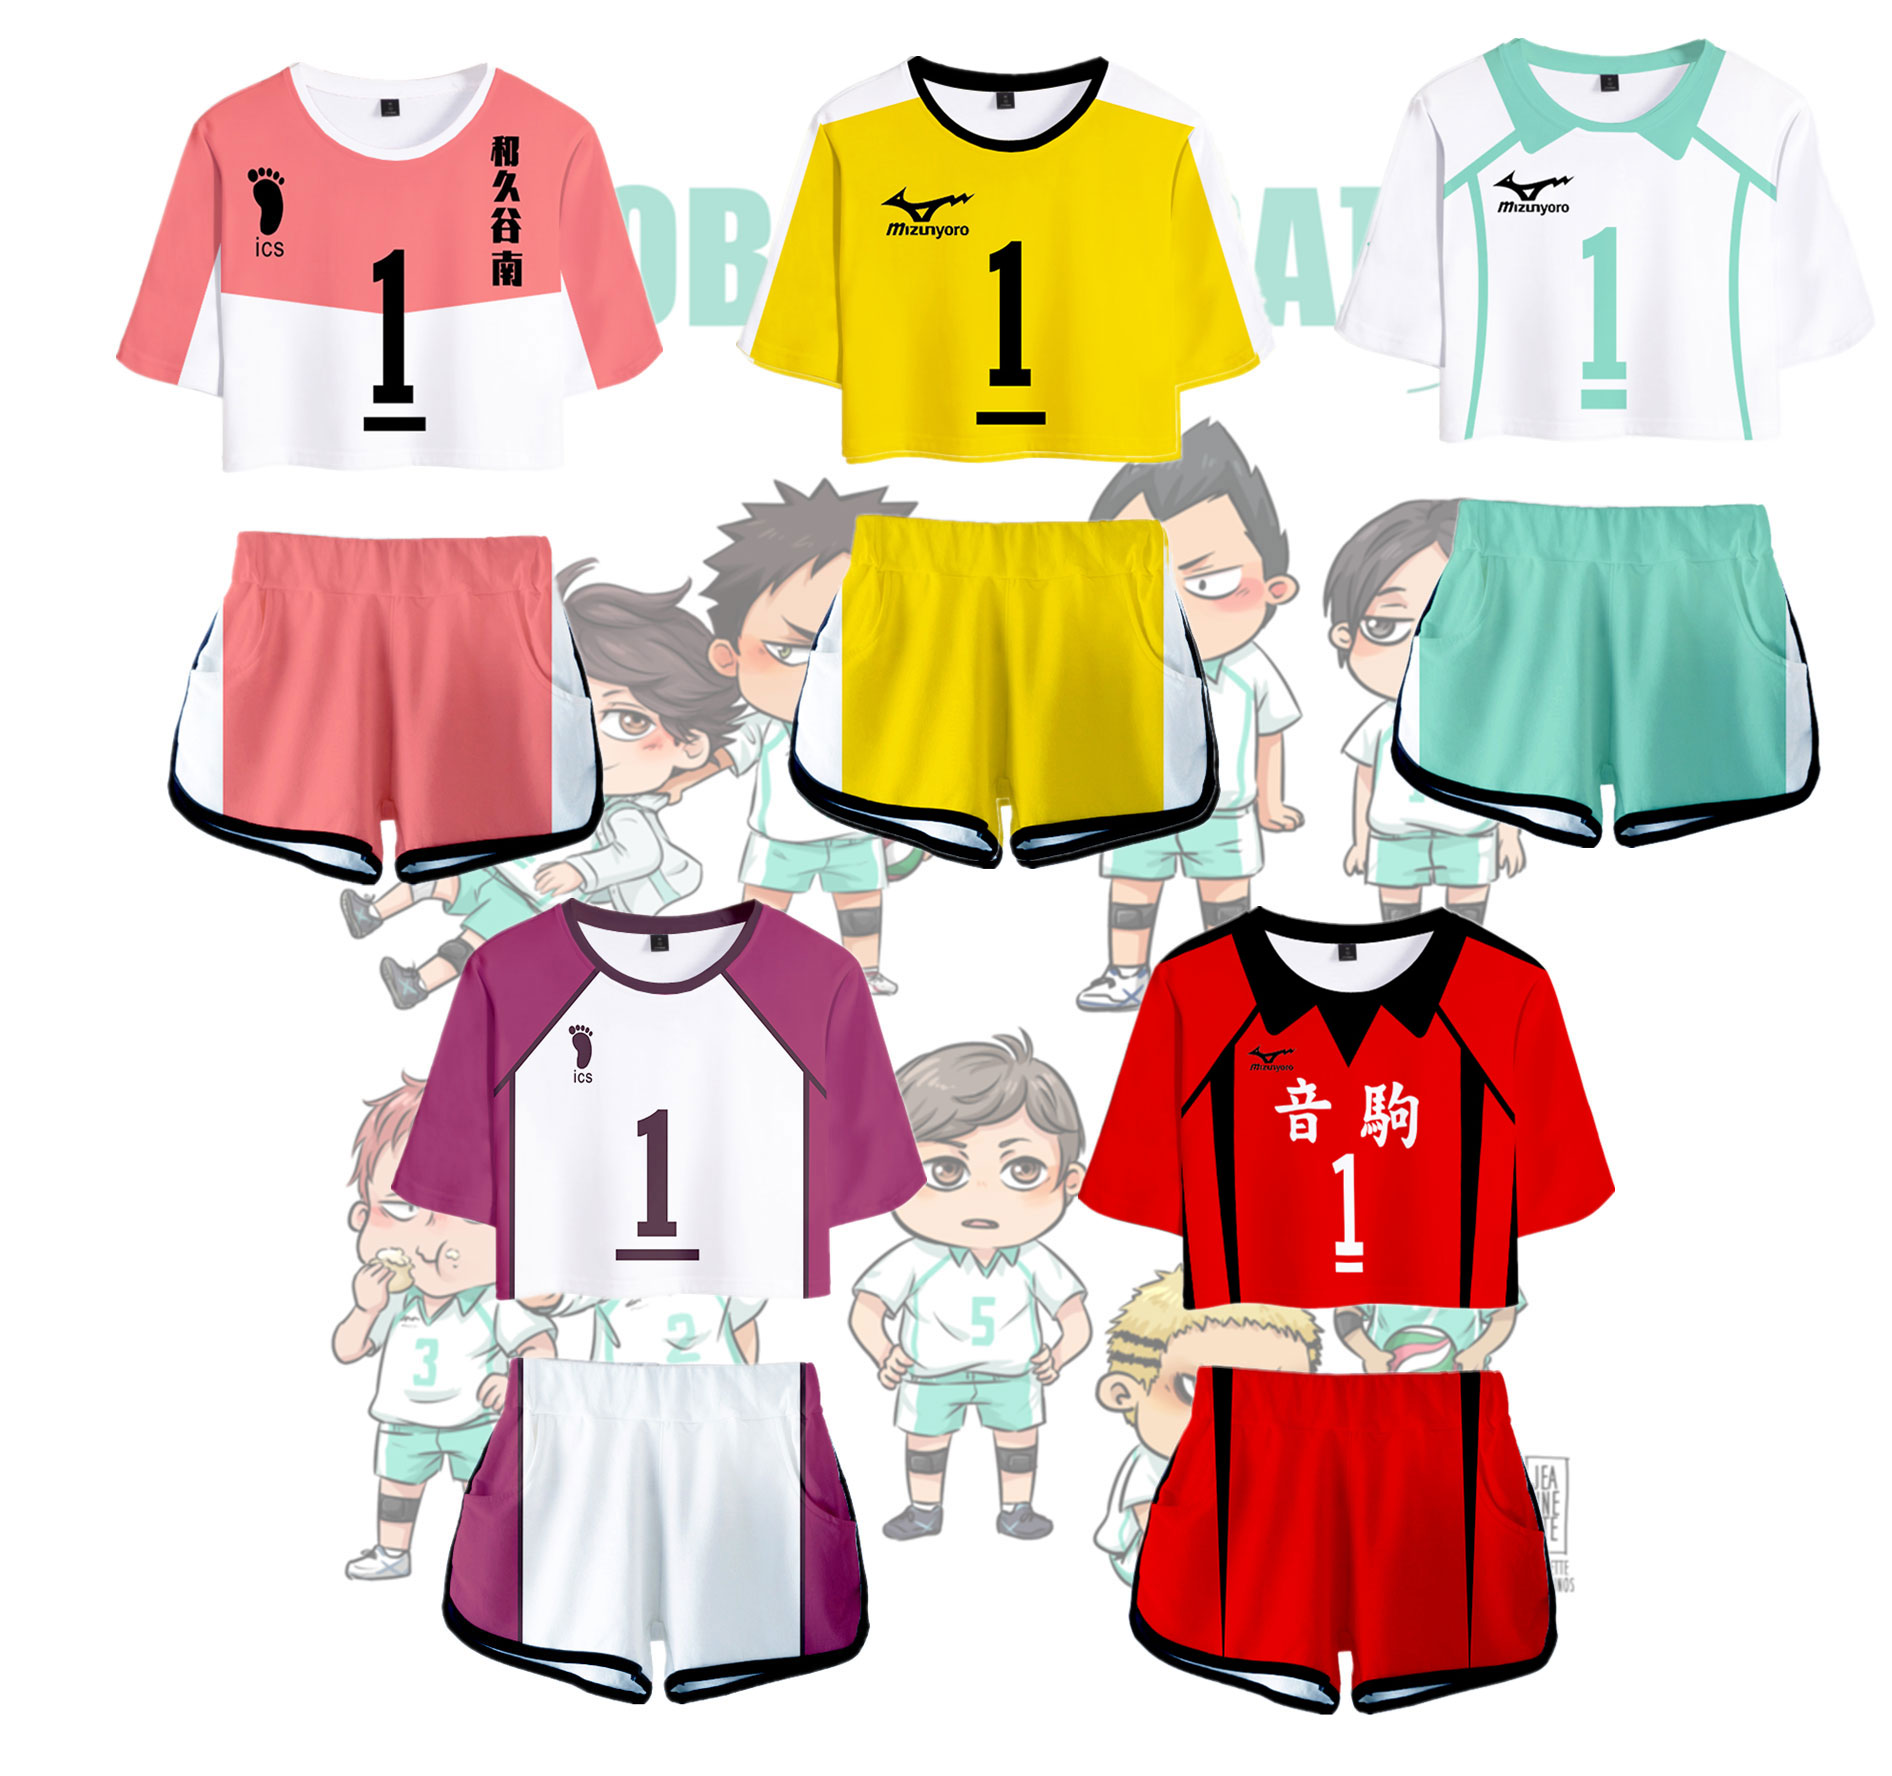 Karasuno High School Uniform Cosplay sugawara koushi Shirt Girl Skirt Haikyuu!